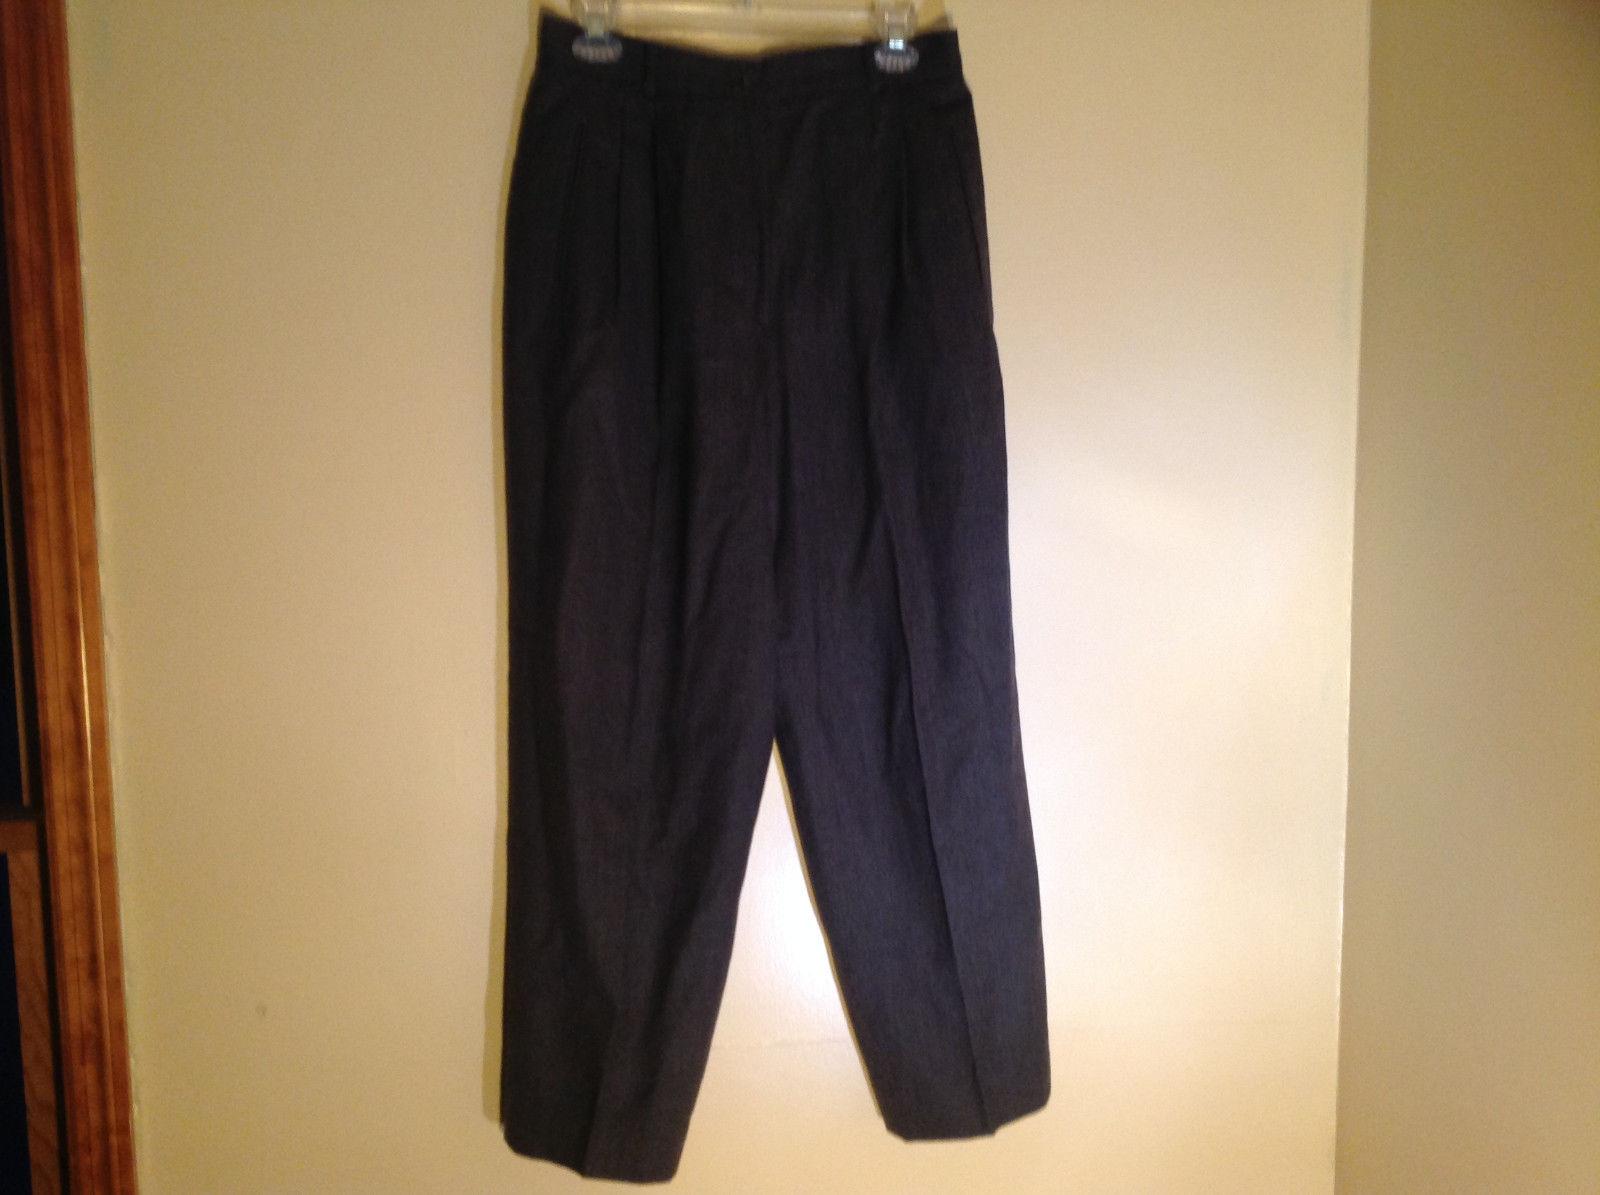 Liz Claiborne Gray Pleated Dress Pants Zipper and Button Closure Size 12